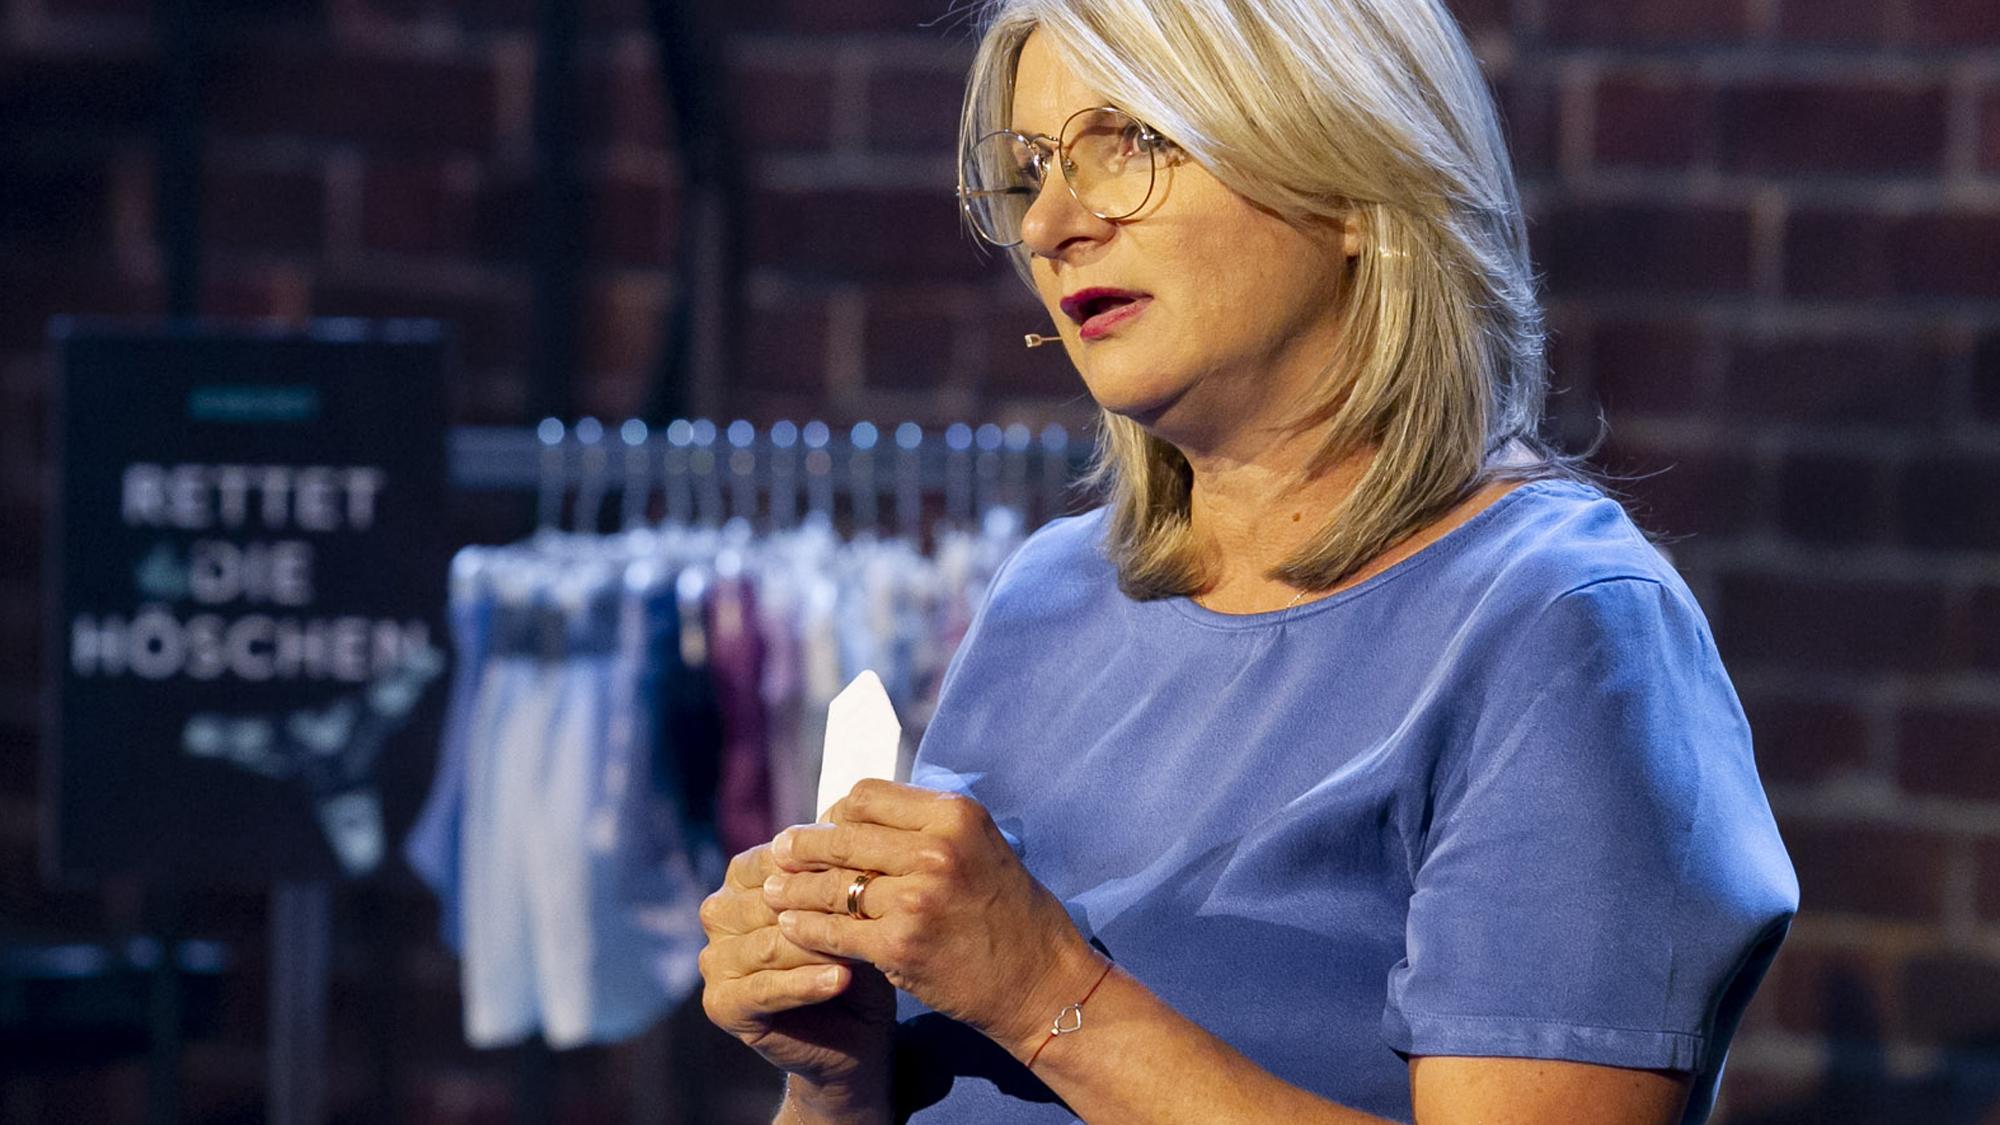 Andrea Lehner präsentiert A'Secret bei 2 Minuten 2 Millionen © Gerry Frank